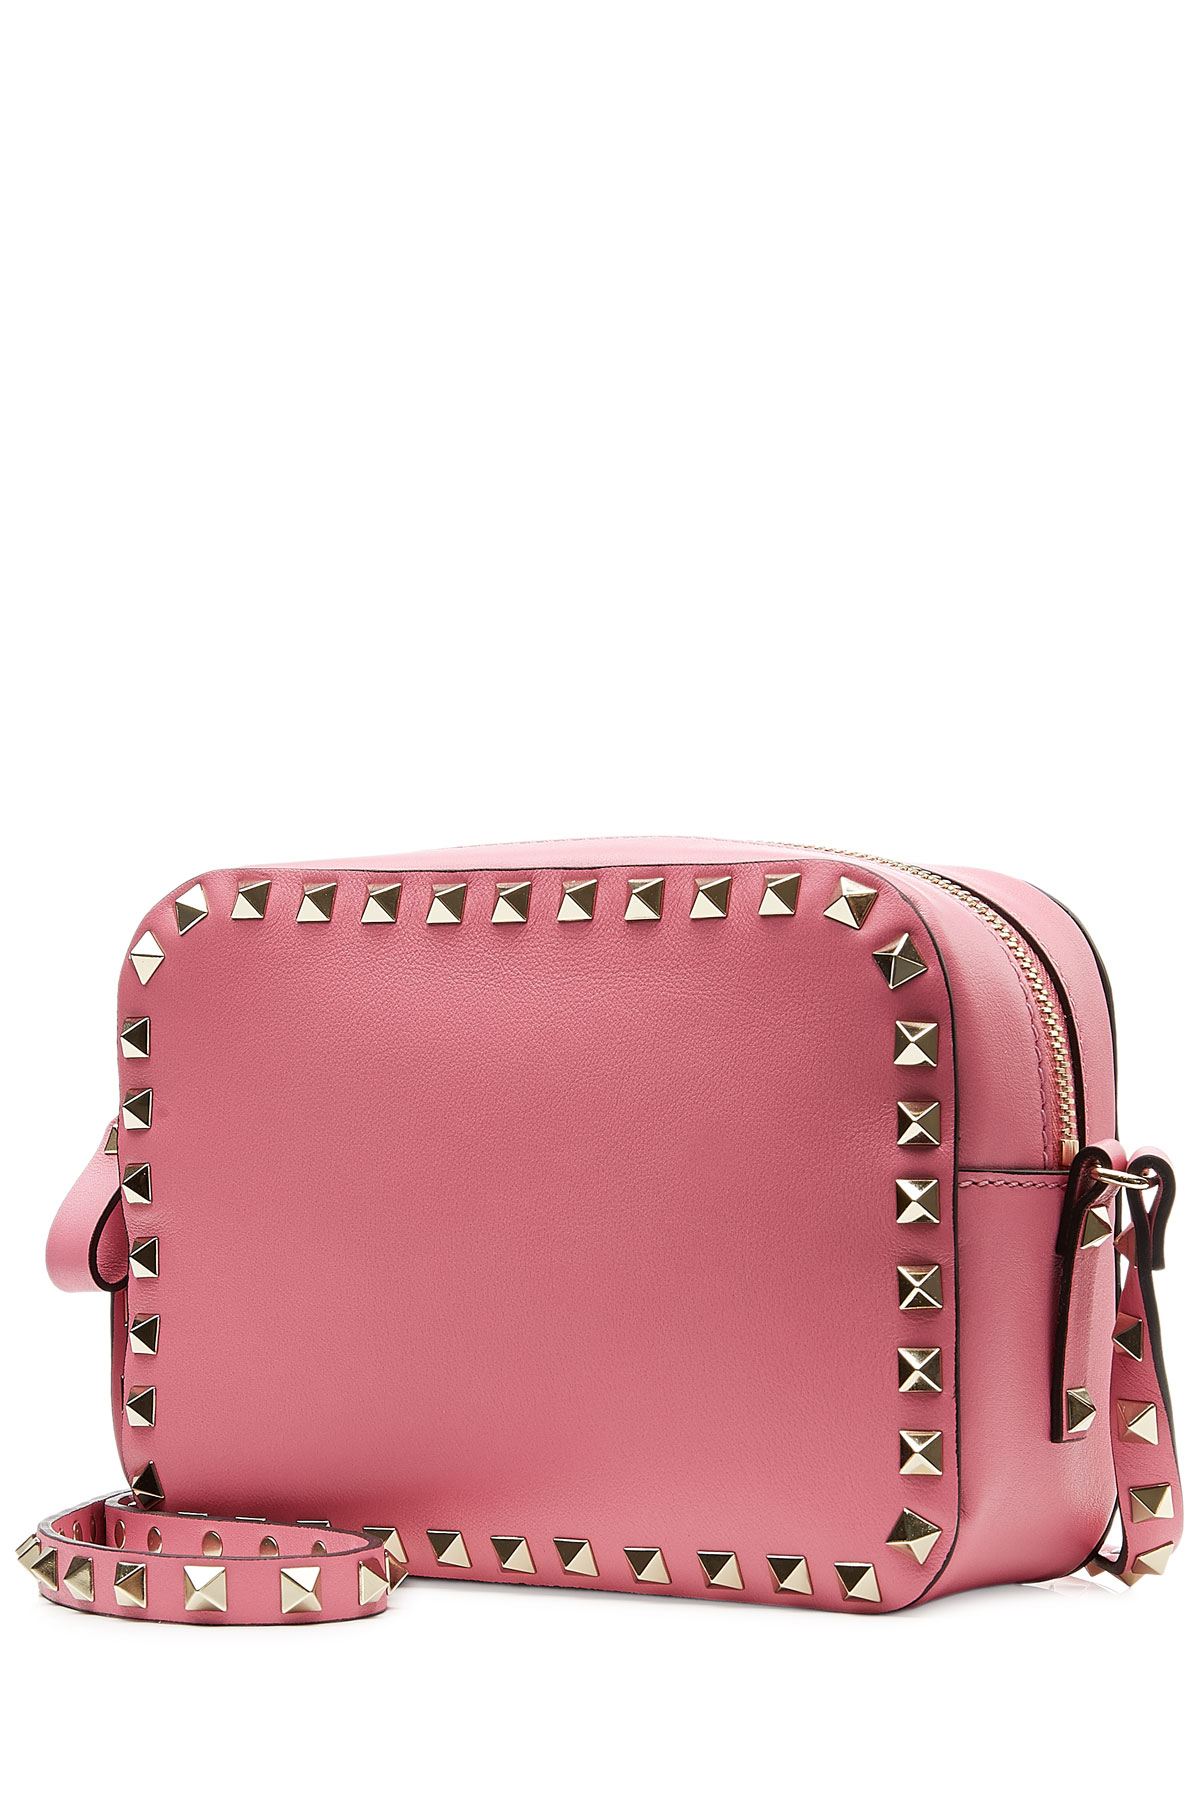 3ca7b7d0684b Valentino Leather Rockstud Camera Bag - Rose in Pink